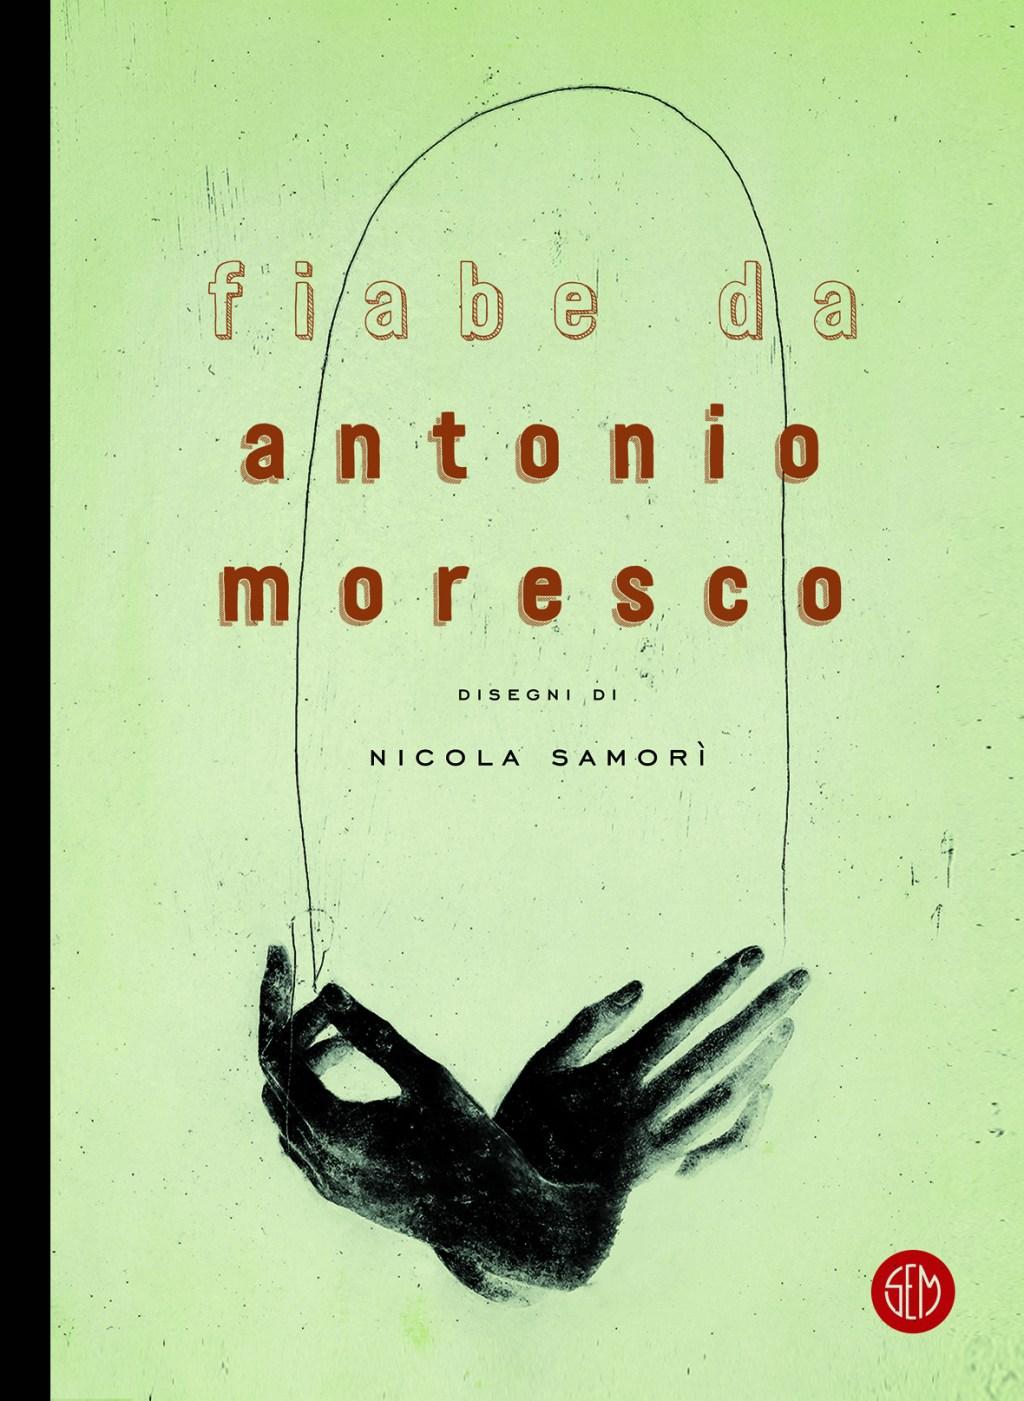 Antonio Moresco